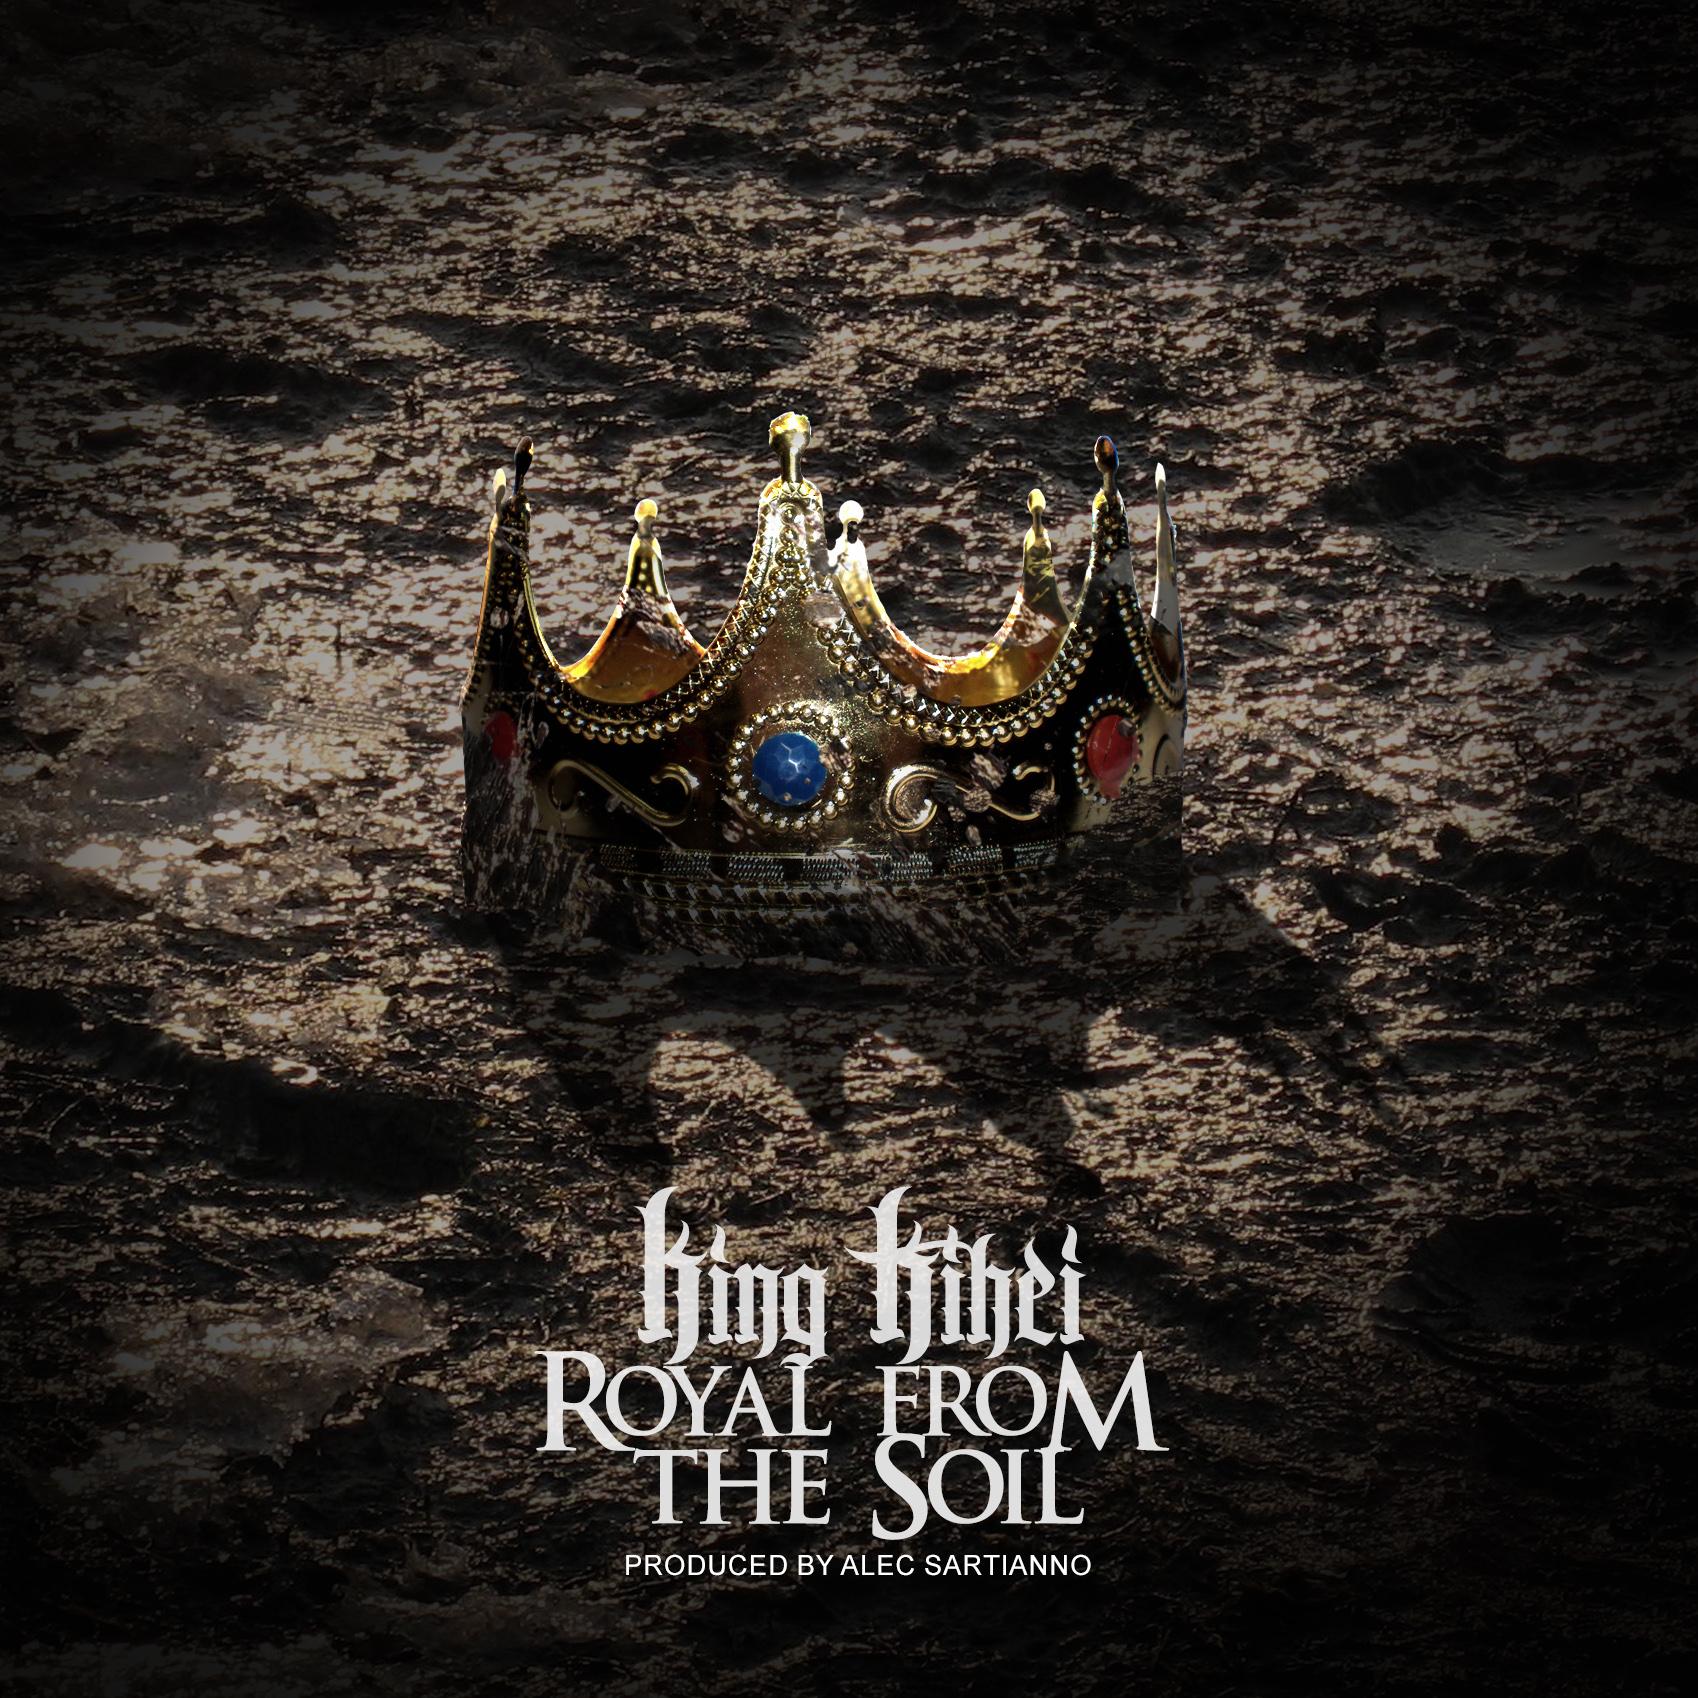 King Kihei | Royal from the Soil official artwork